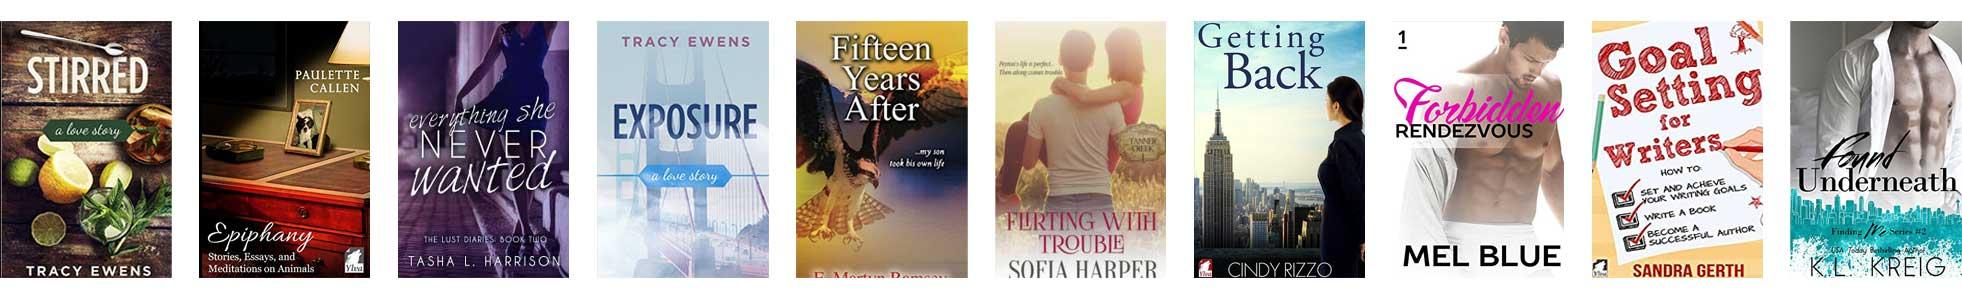 Nikki Busch Editing, Portfolio of Books